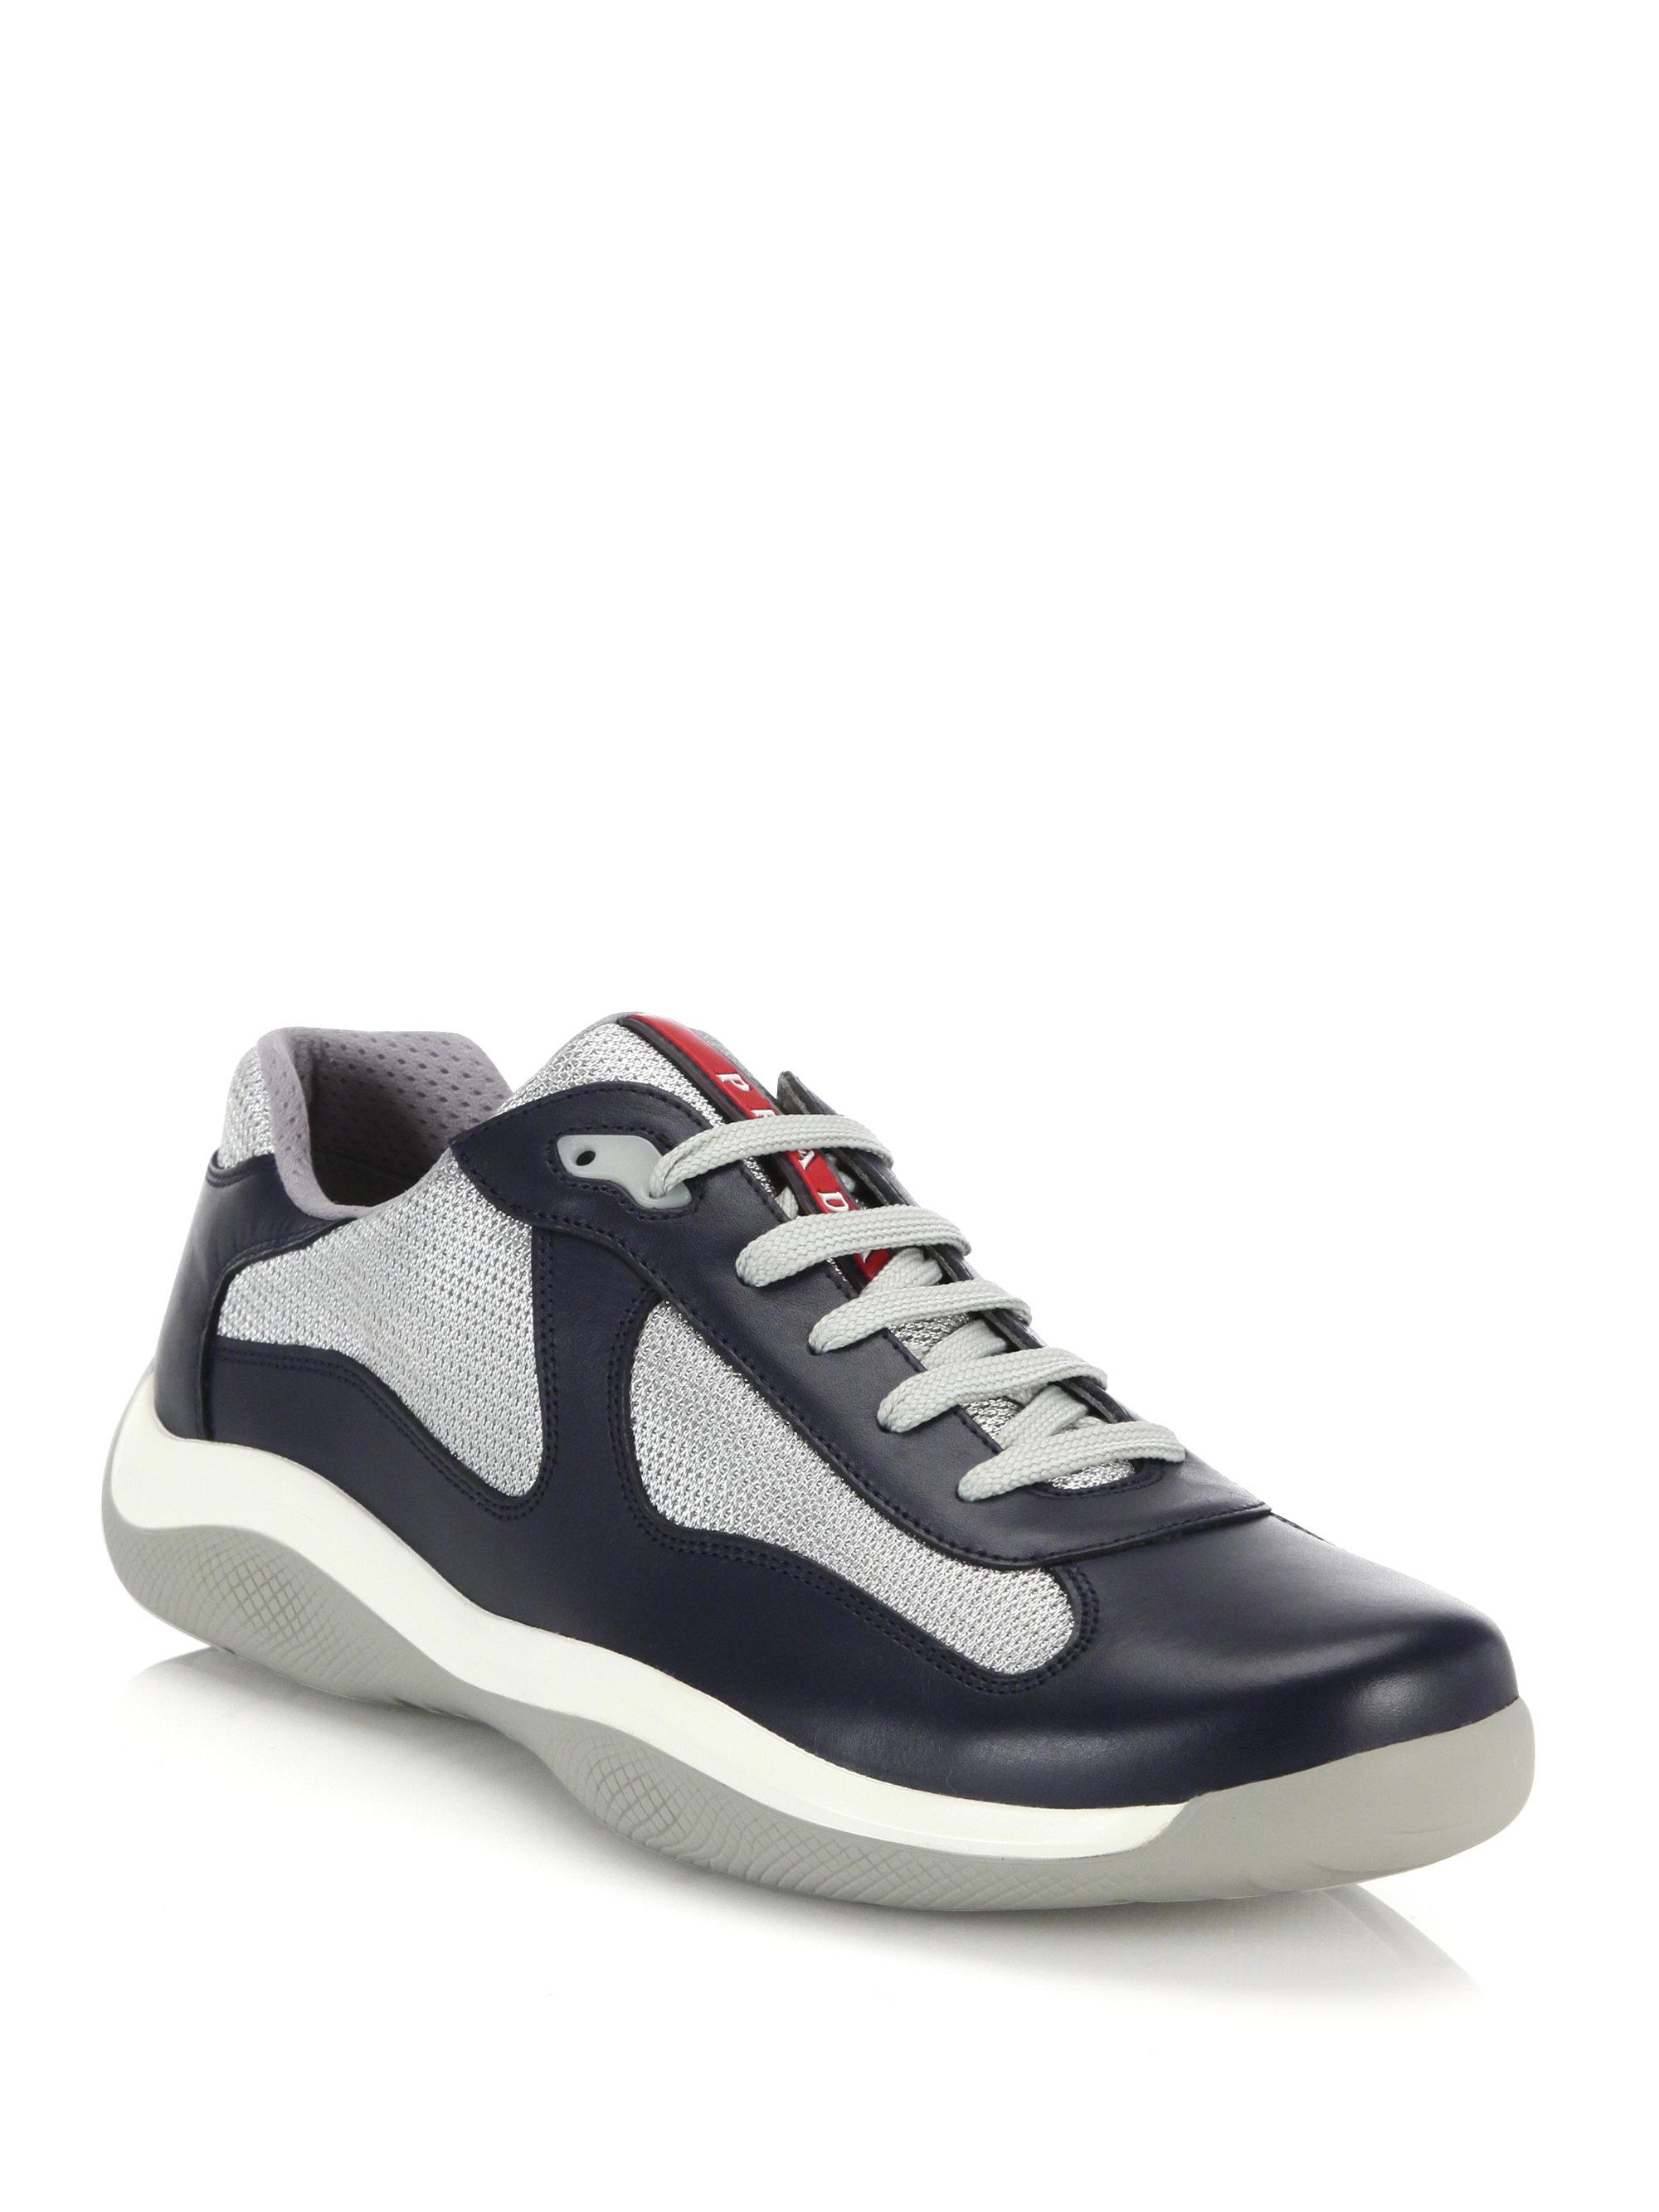 Prada Leather & Mesh Sneakers in White for Men | Lyst